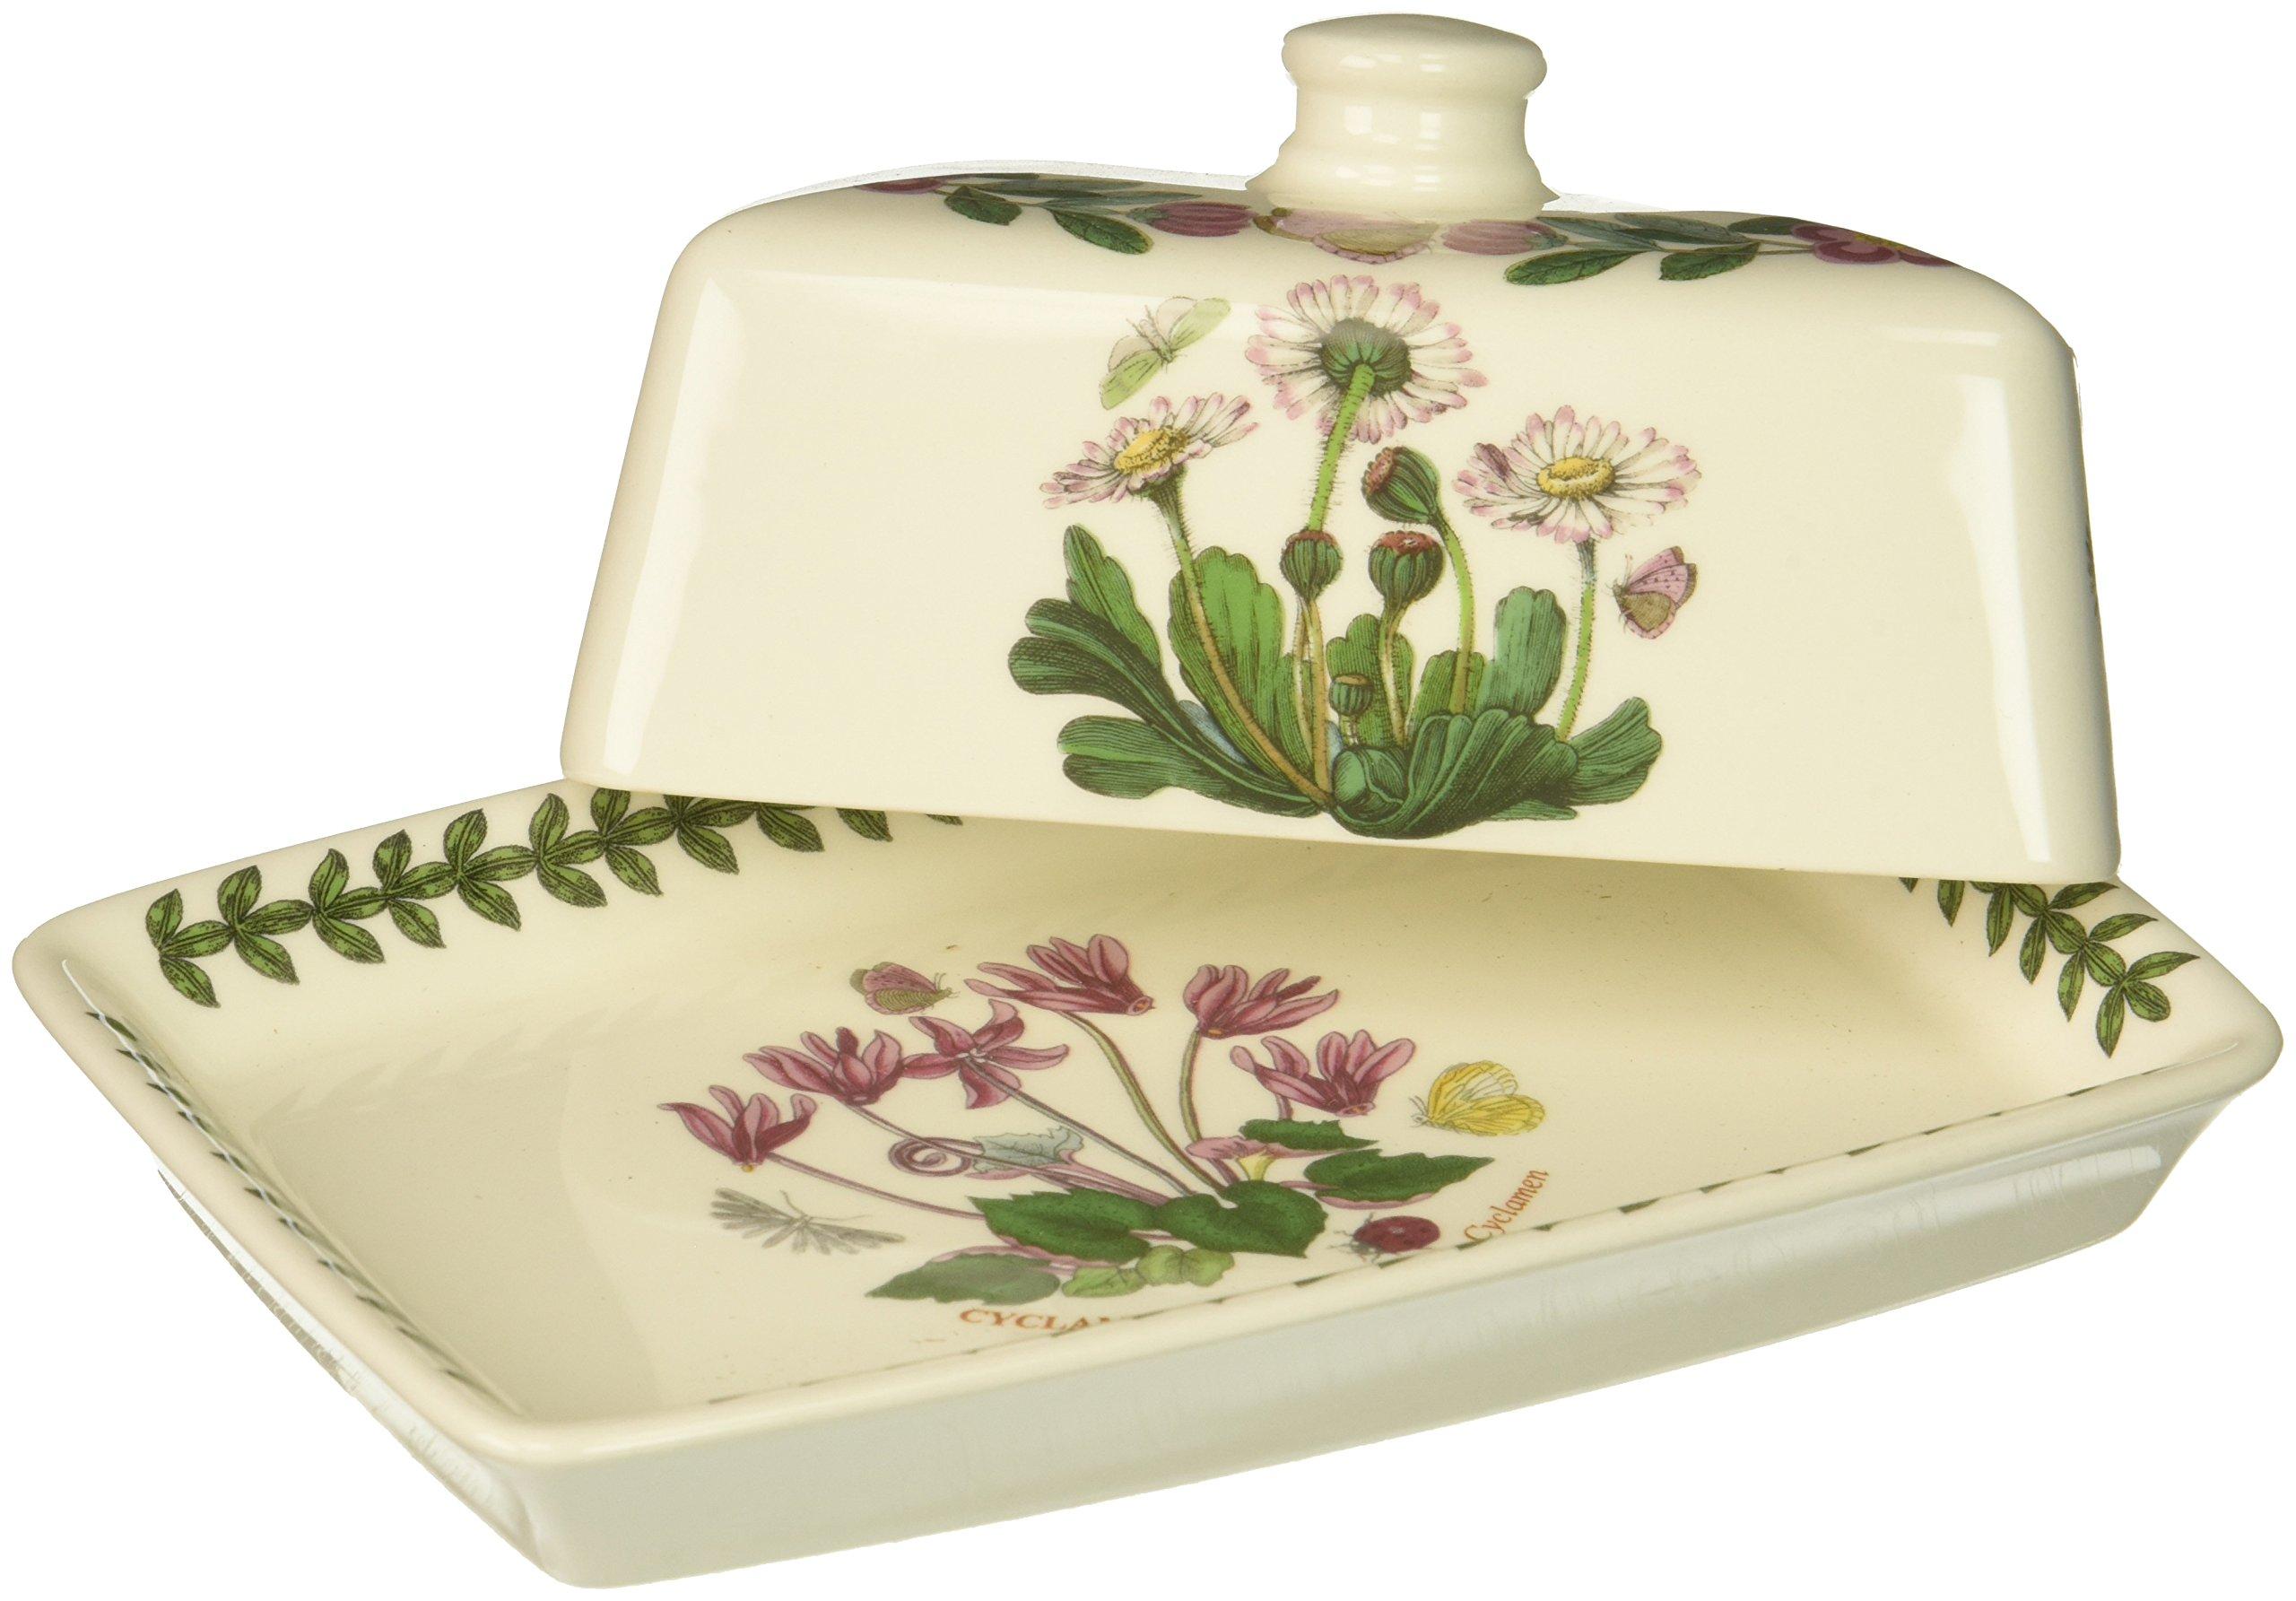 Portmeirion Botanic Garden Covered Butter Dish by Portmeirion (Image #2)